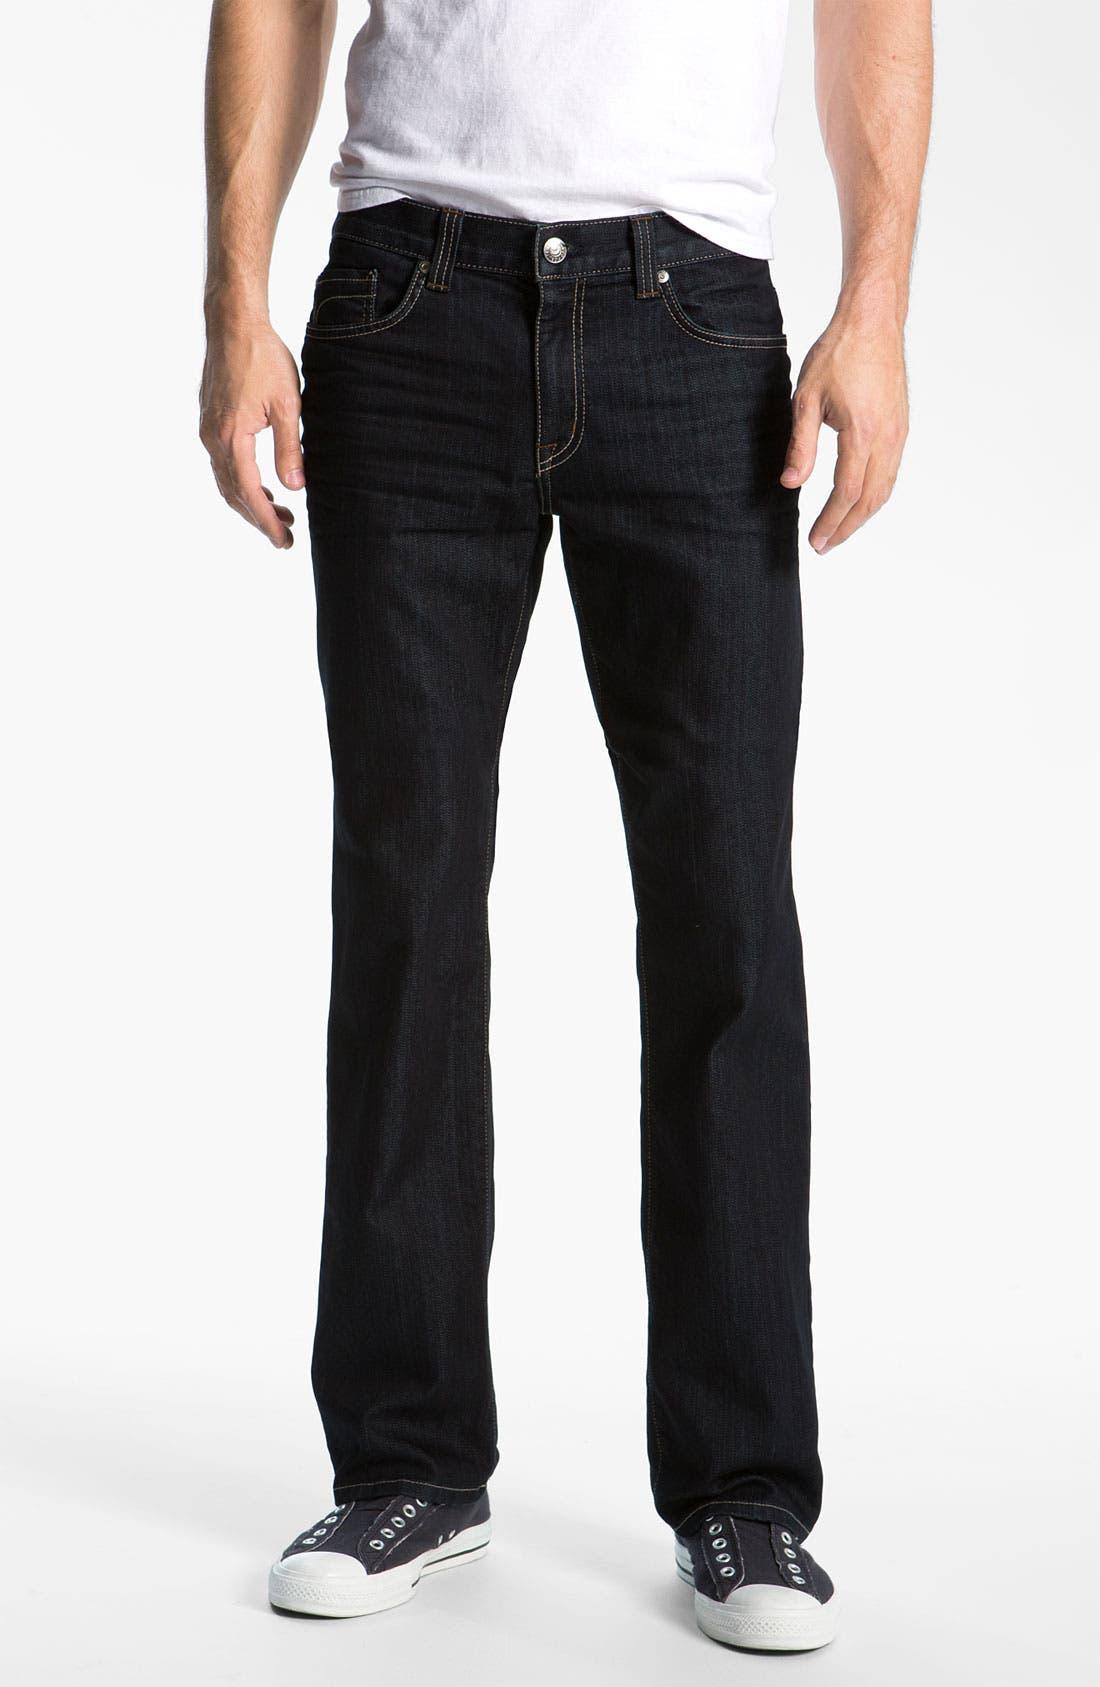 '50-11' Straight Leg Jeans,                             Main thumbnail 1, color,